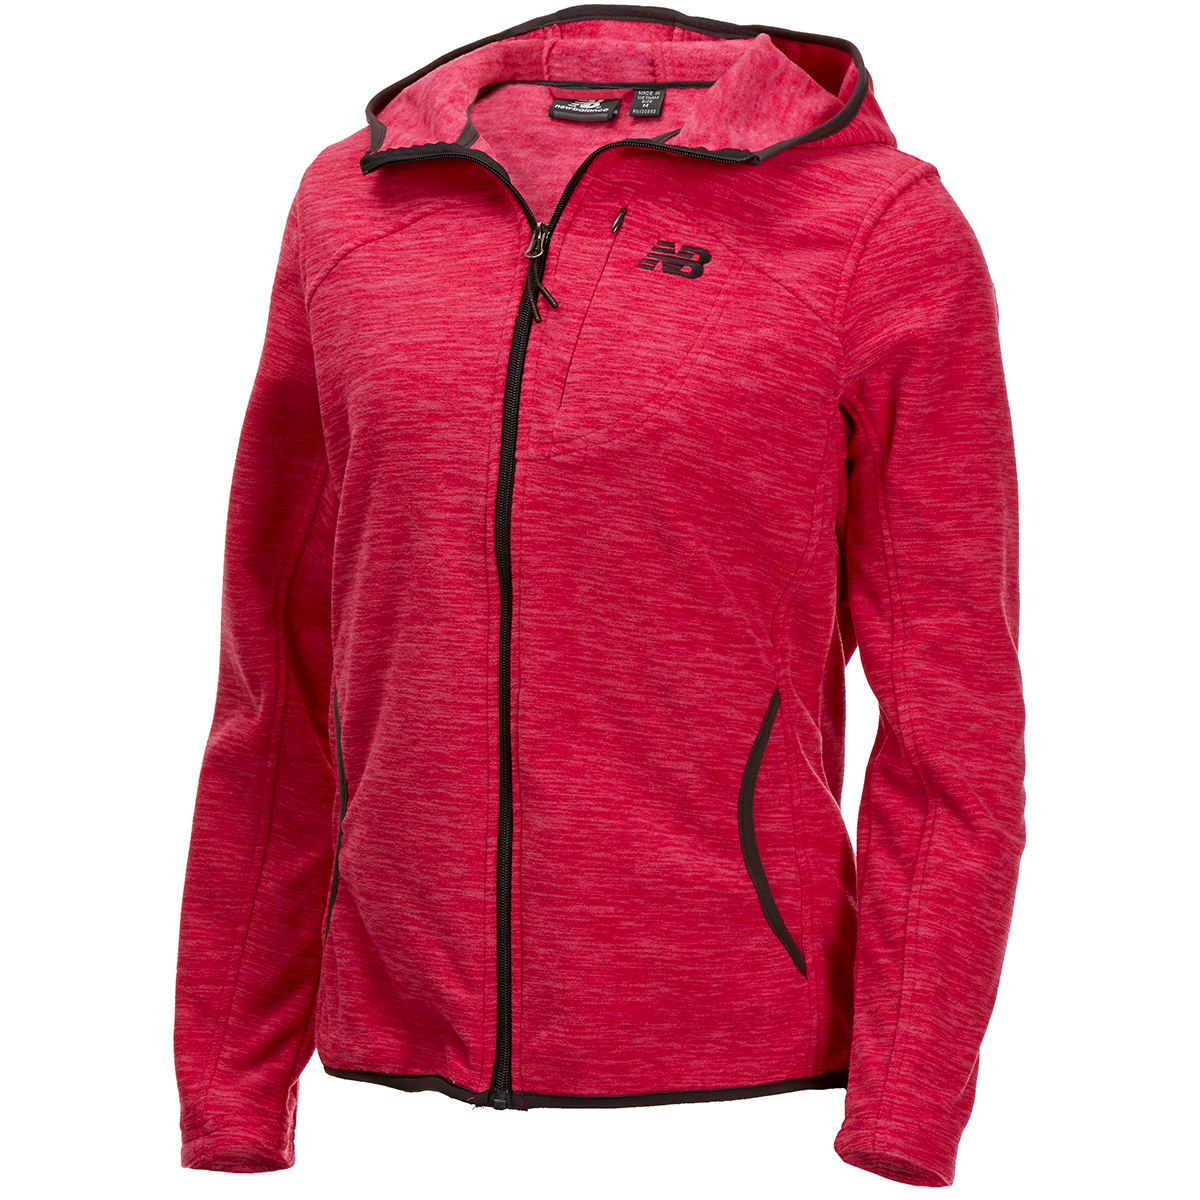 New Balance Women's Polar Fleece Space-Dye Full-Zip Hoodie - Red, L